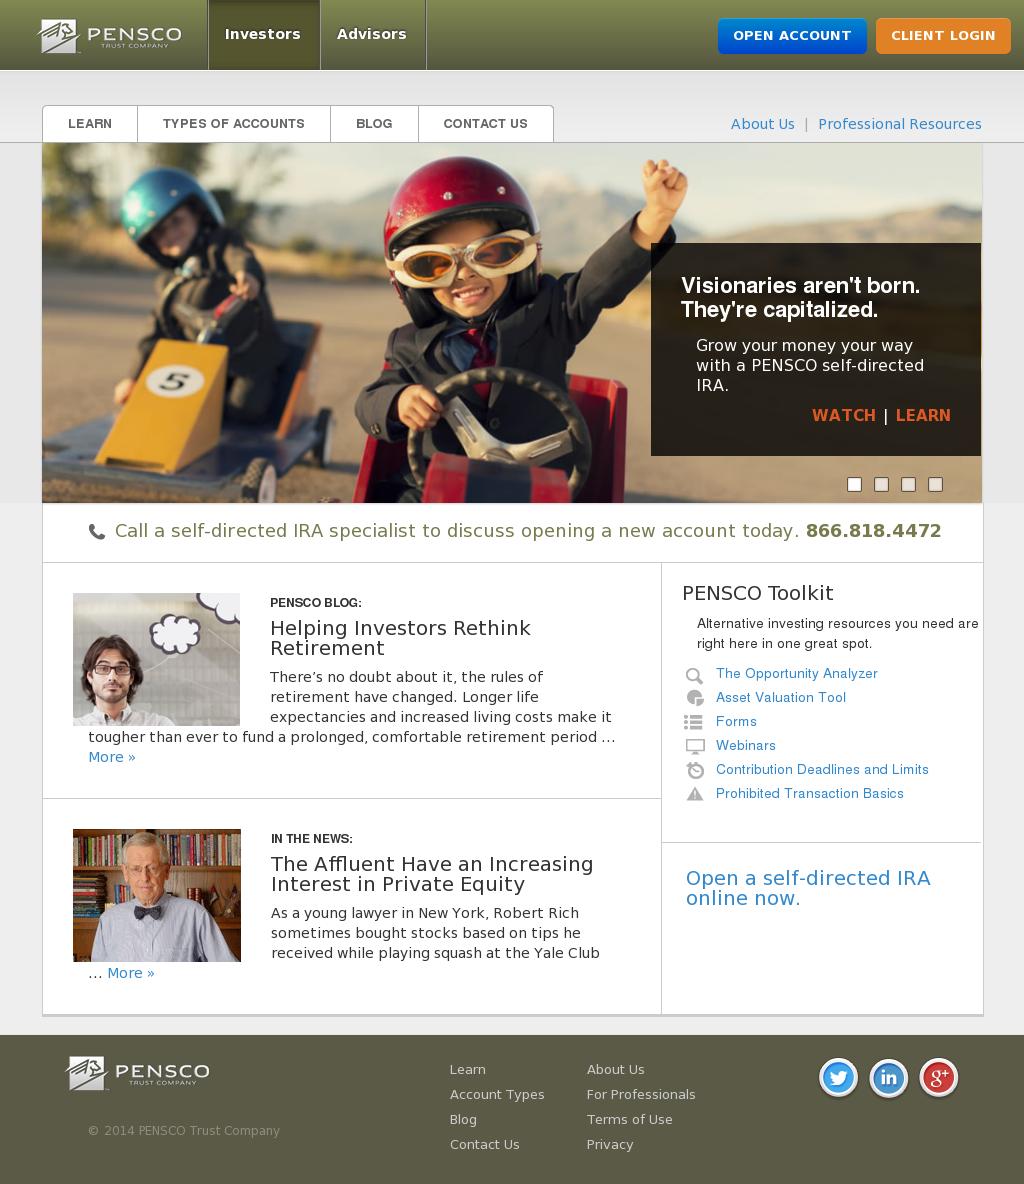 PENSCO Competitors, Revenue and Employees - Owler Company